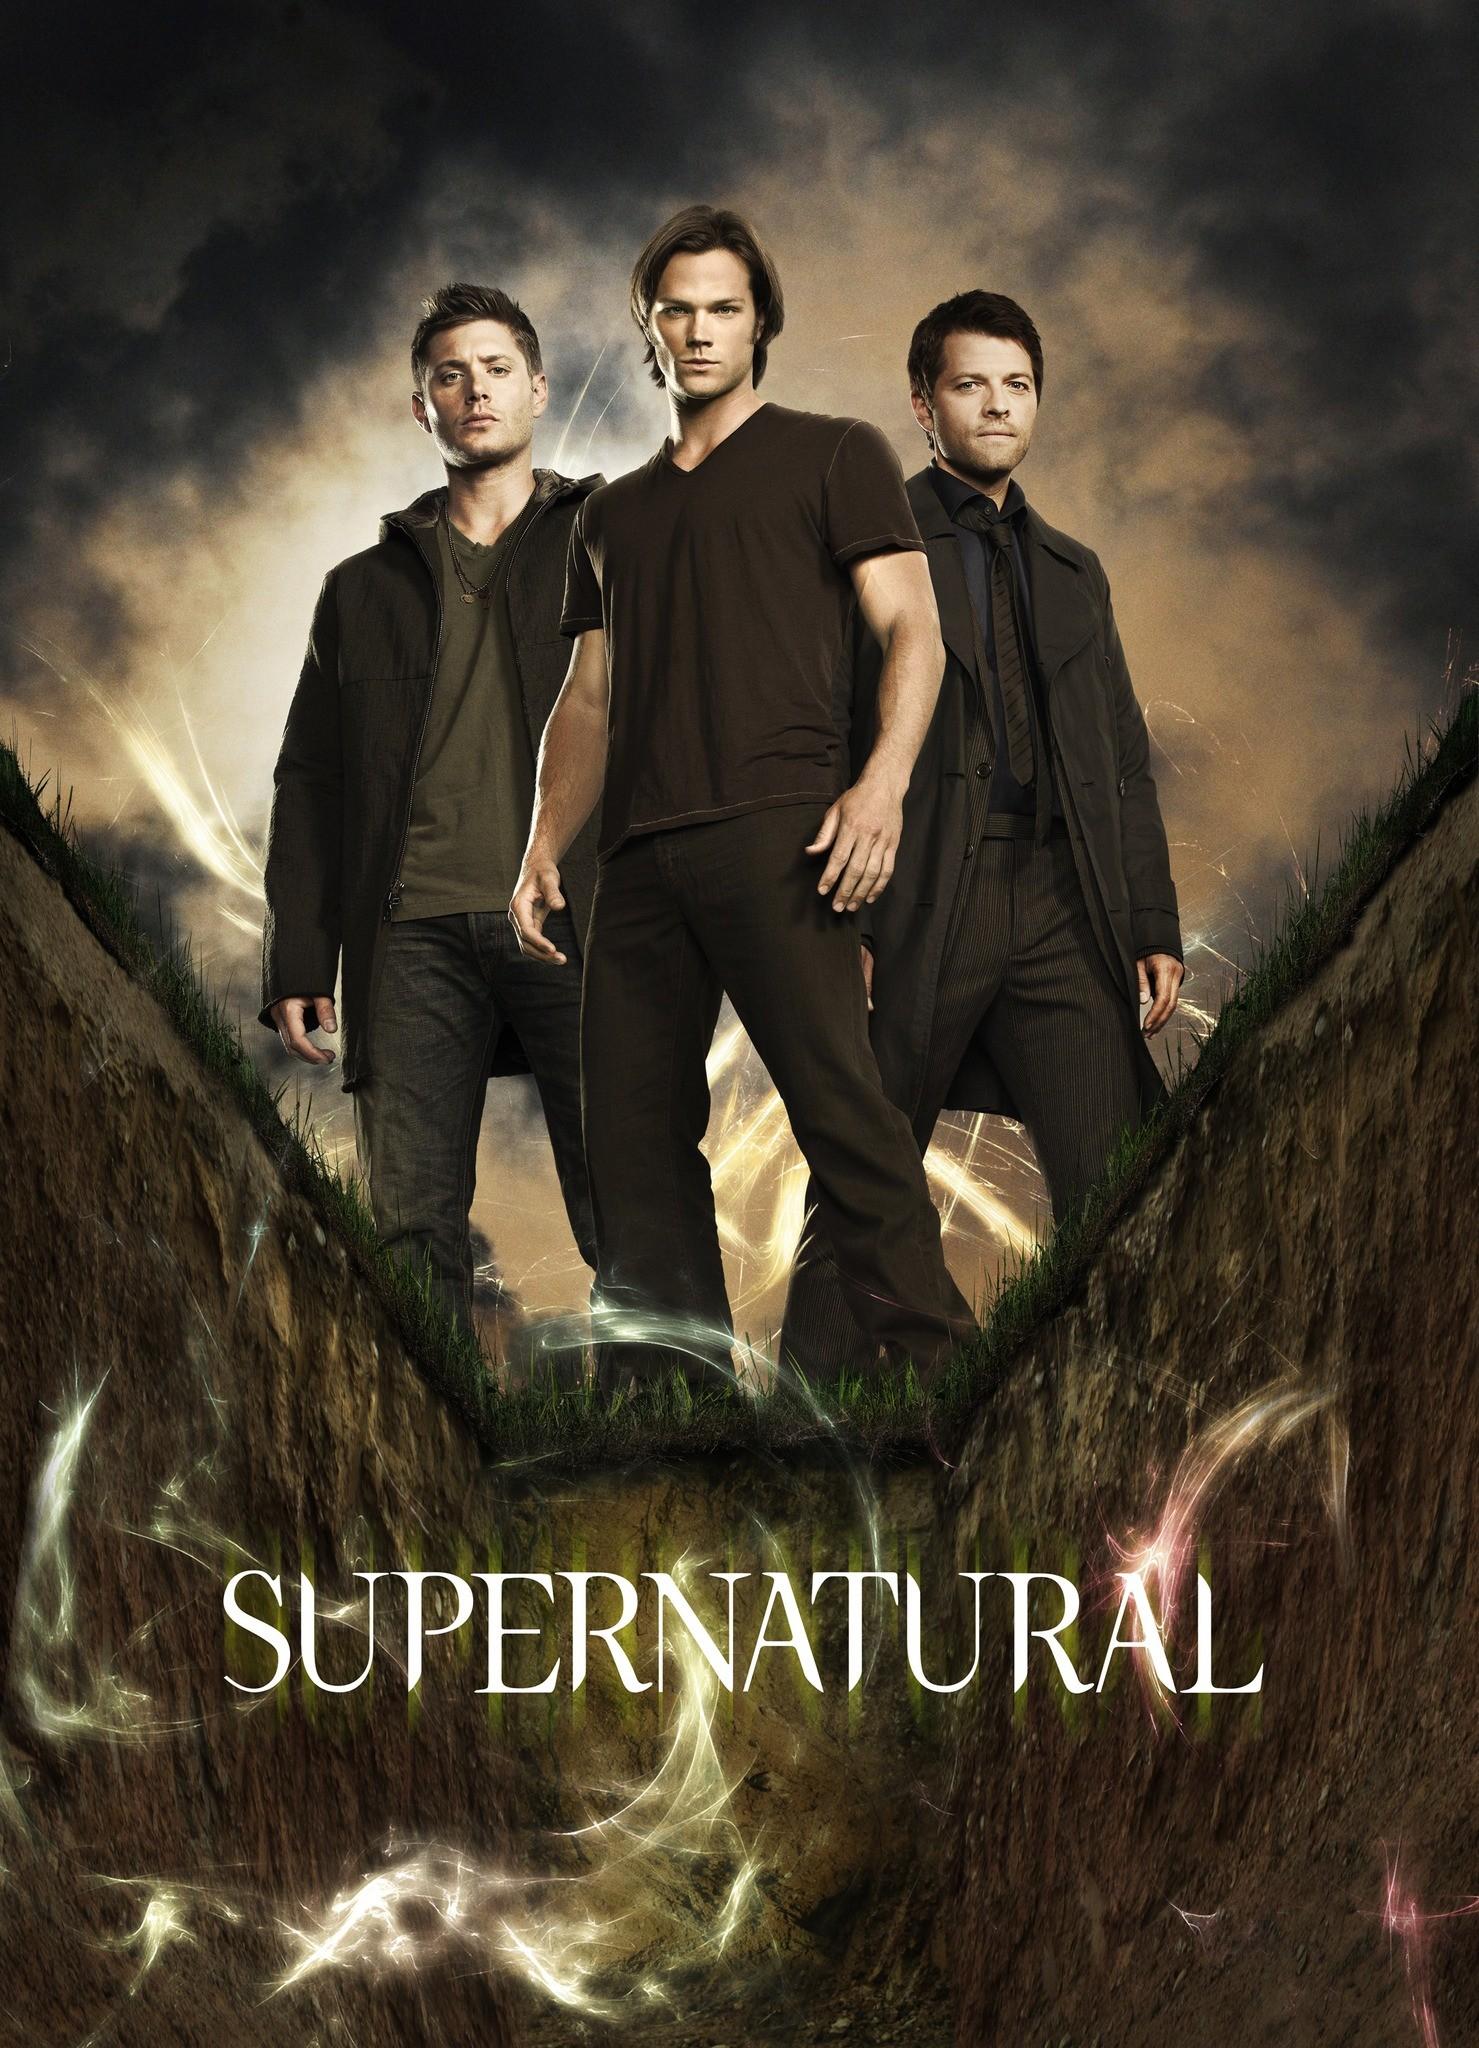 Dean, Castiel, And Sam Images Castiel, Sam, Dean Hd - Supernatural Movie Poster - HD Wallpaper